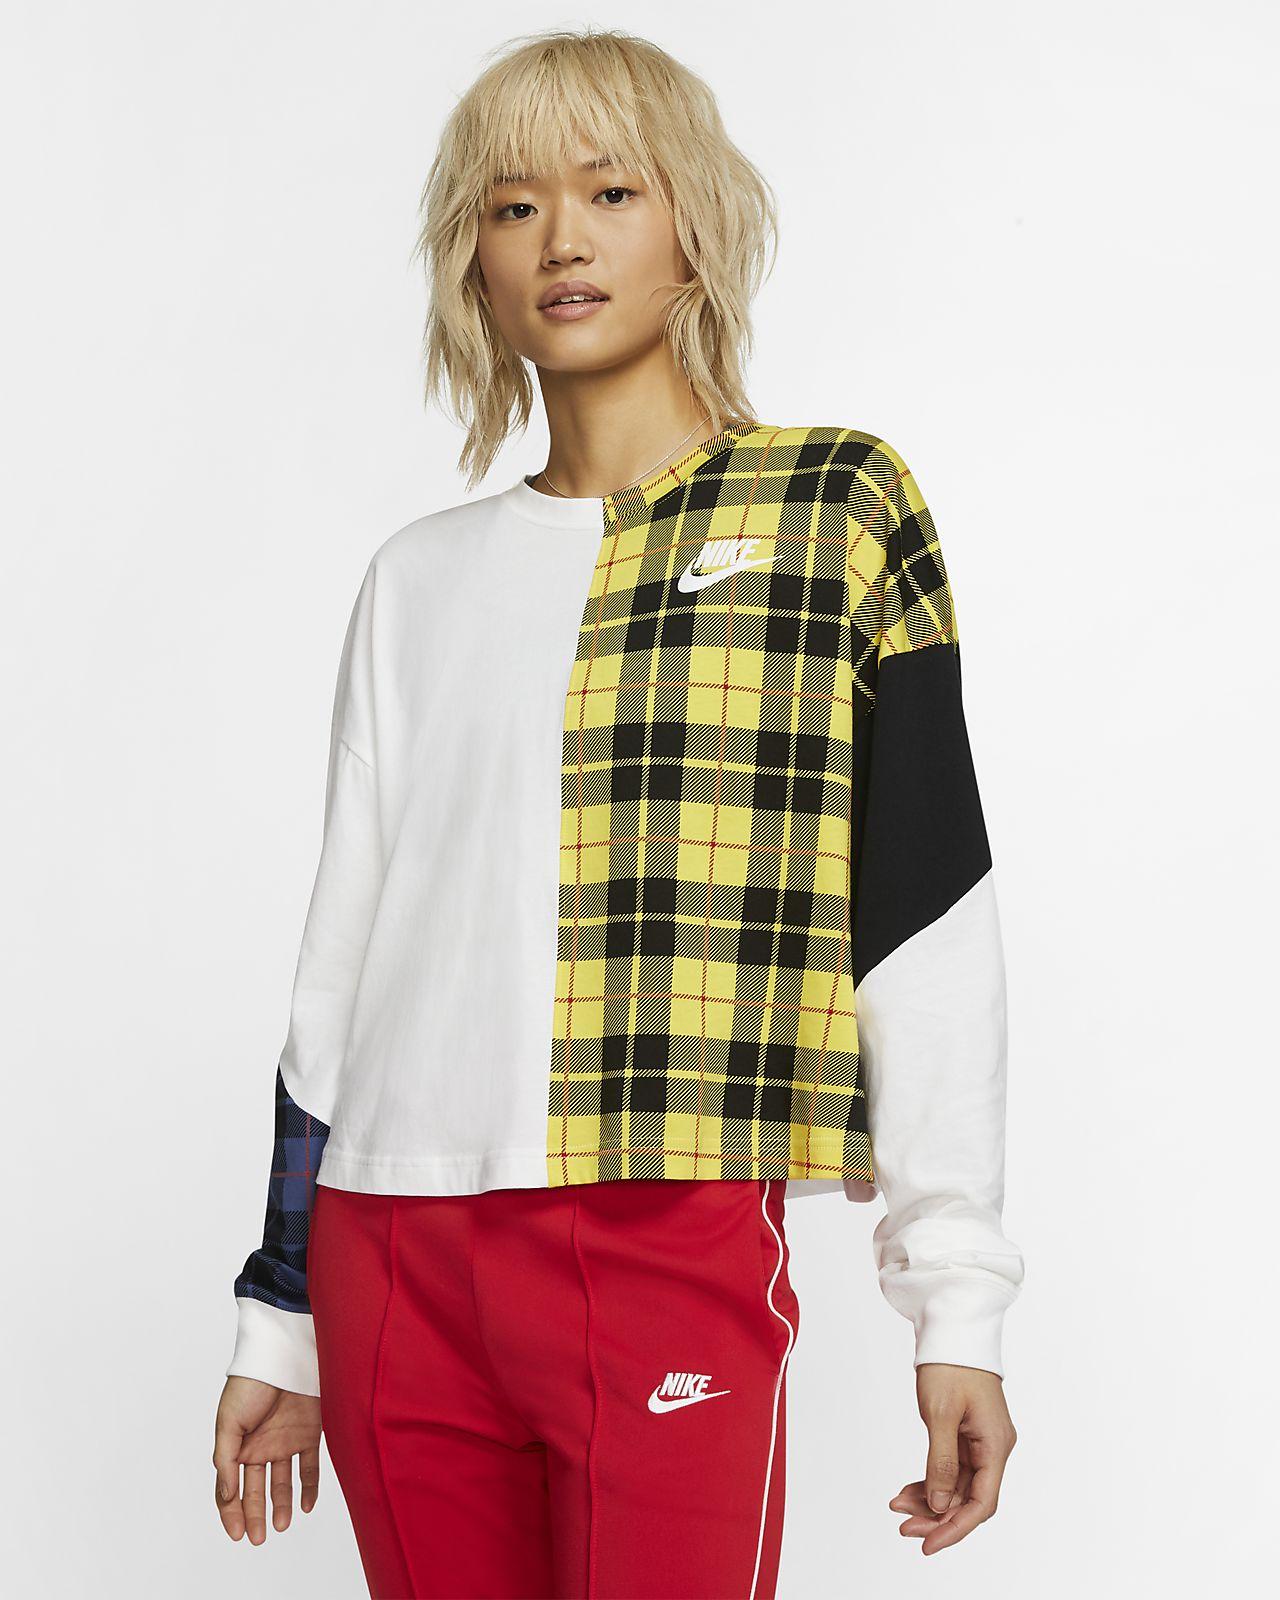 Prenda para la parte superior de manga larga para mujer Nike Sportswear NSW